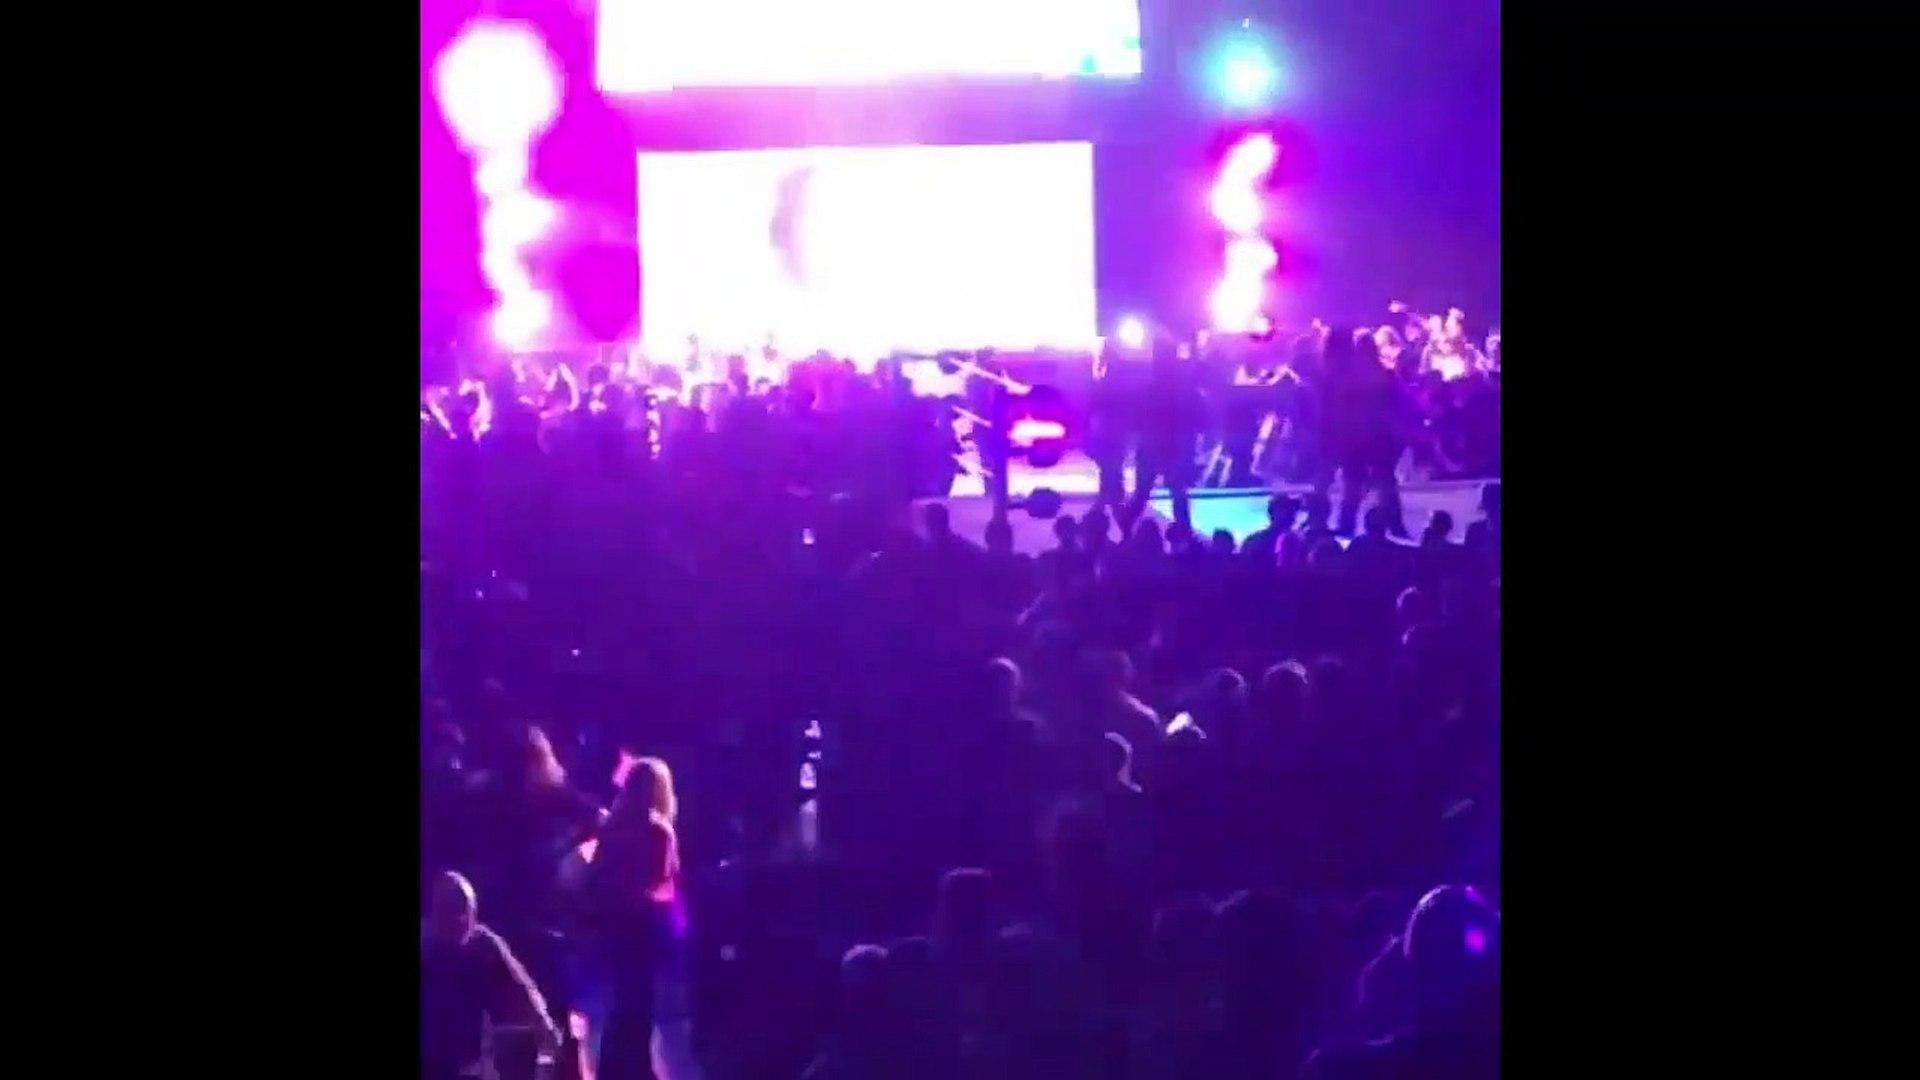 WWE RAW Live Event Highlights Birmingham 2019 FULL-Show HD - WWE RAW Live Highlights 15 May 2019 HD